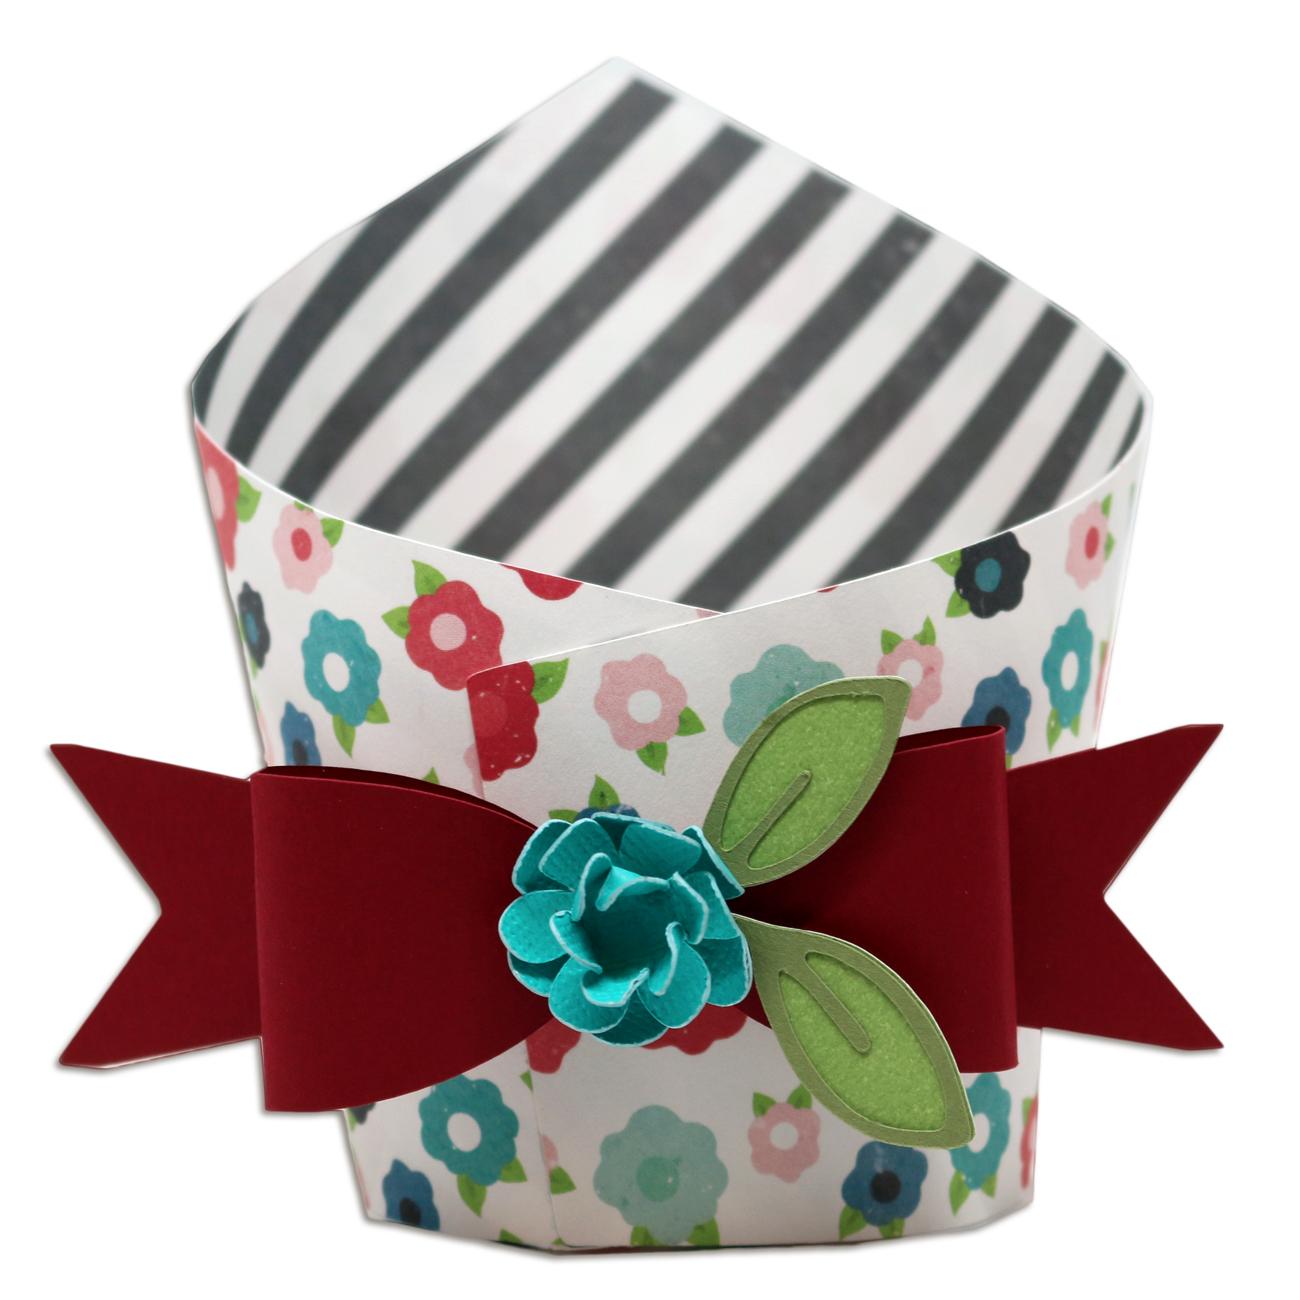 Bits of Paper: Wrap Boxes